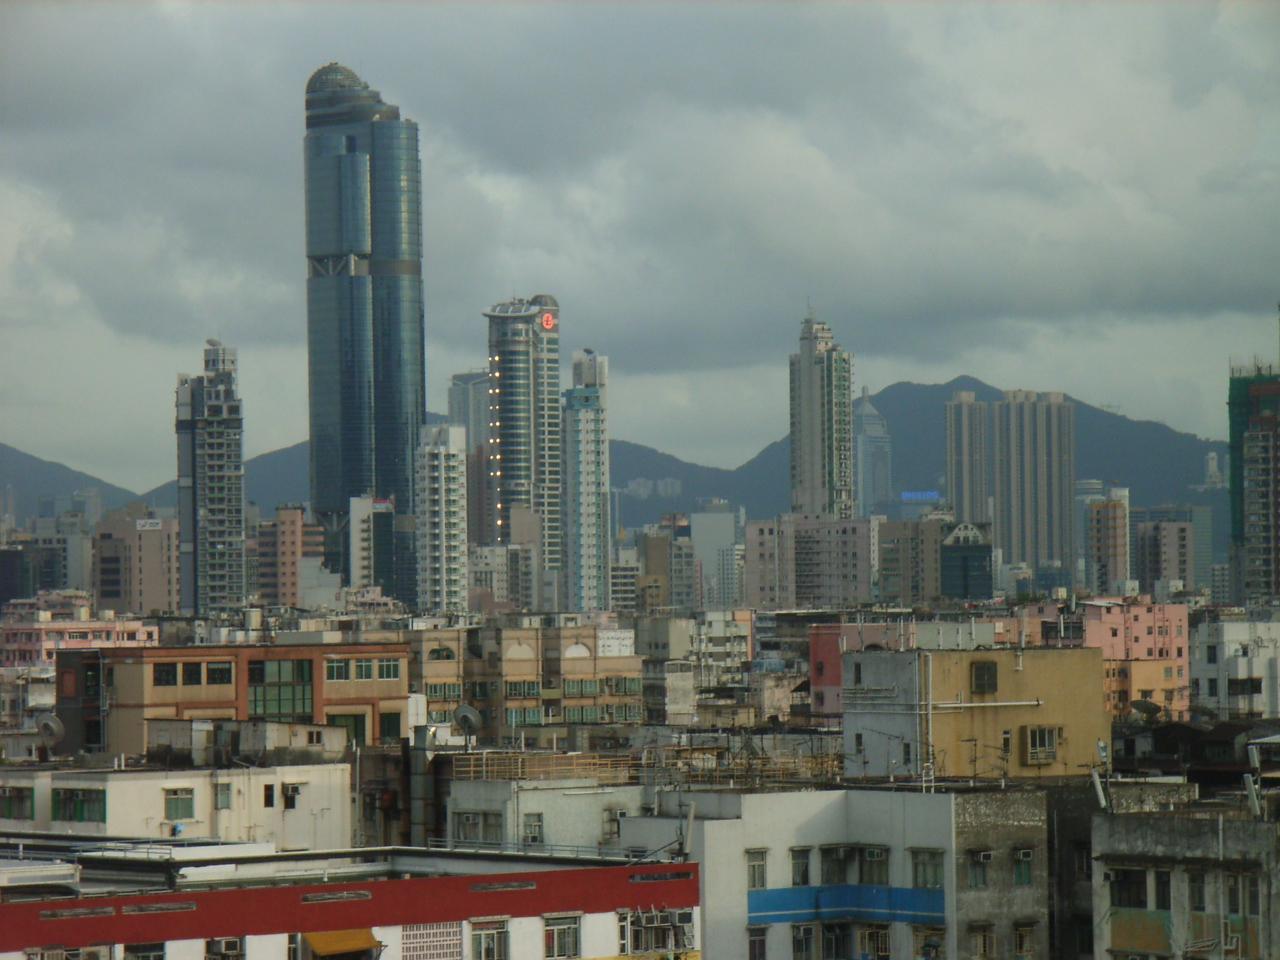 HK_Shek_Kip_Mei_Hill_view_Mongkok_Langham_Place_1.JPG